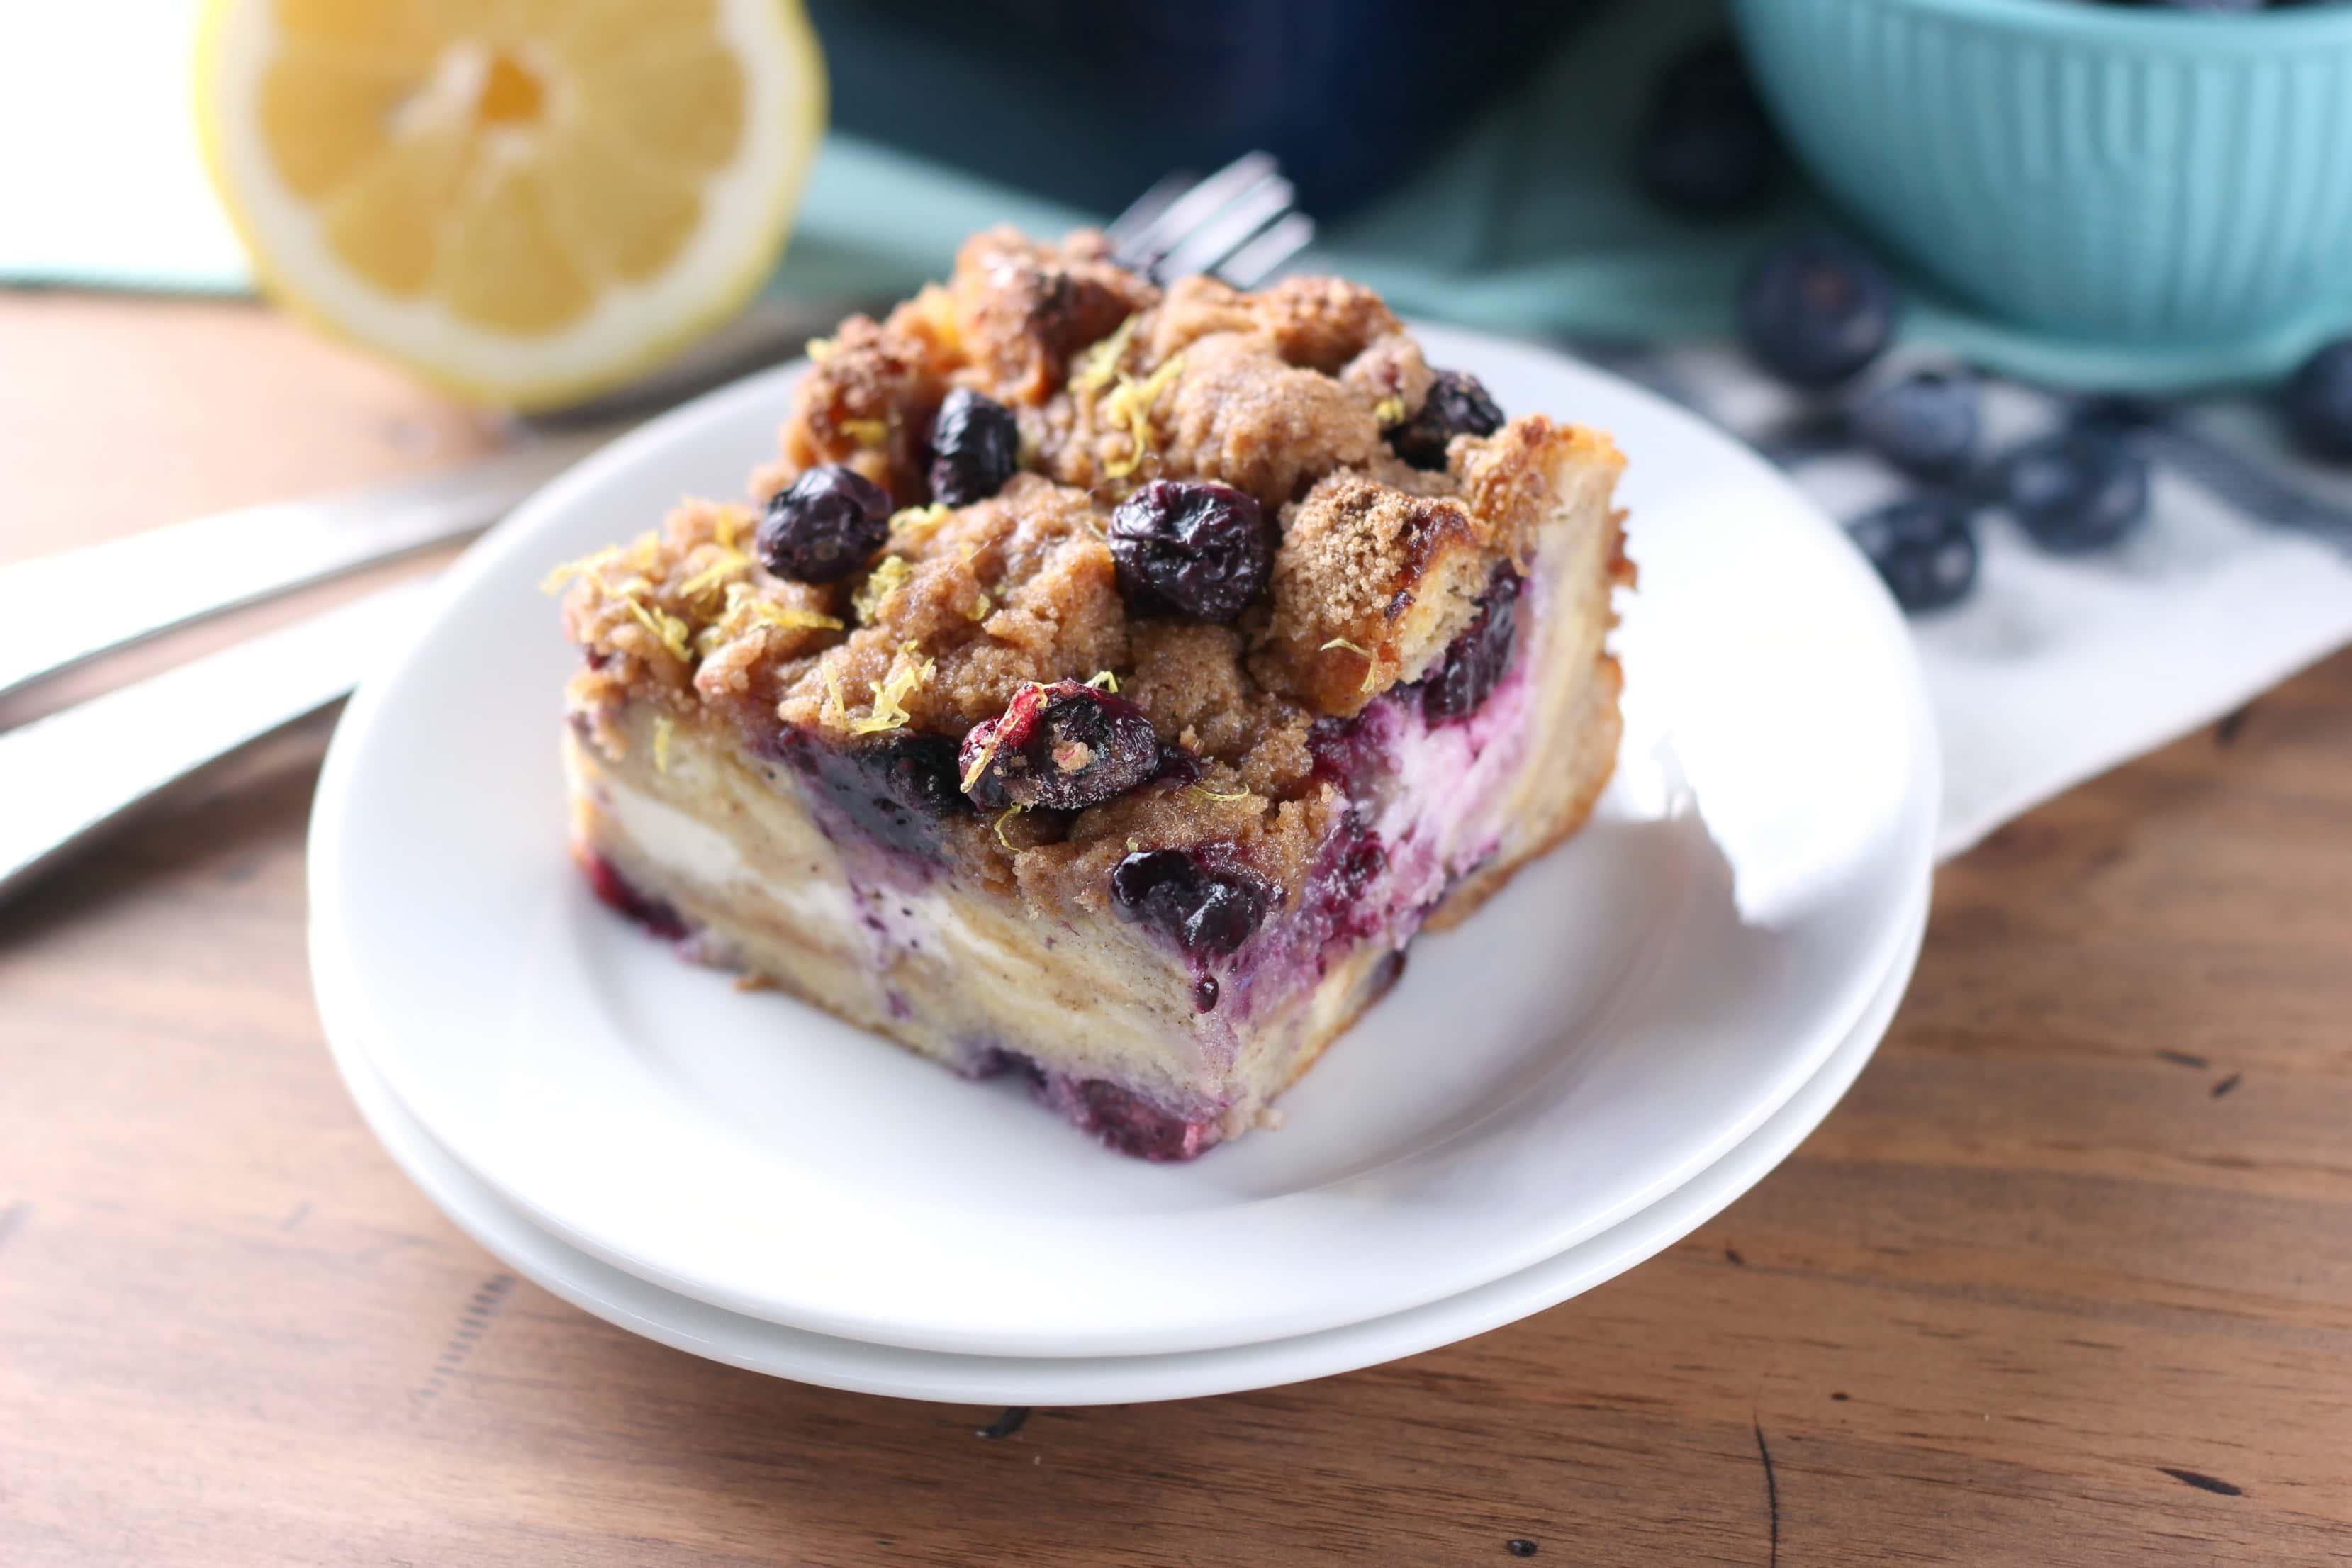 Easy Blueberry Lemon Cream French Casserole Recipe